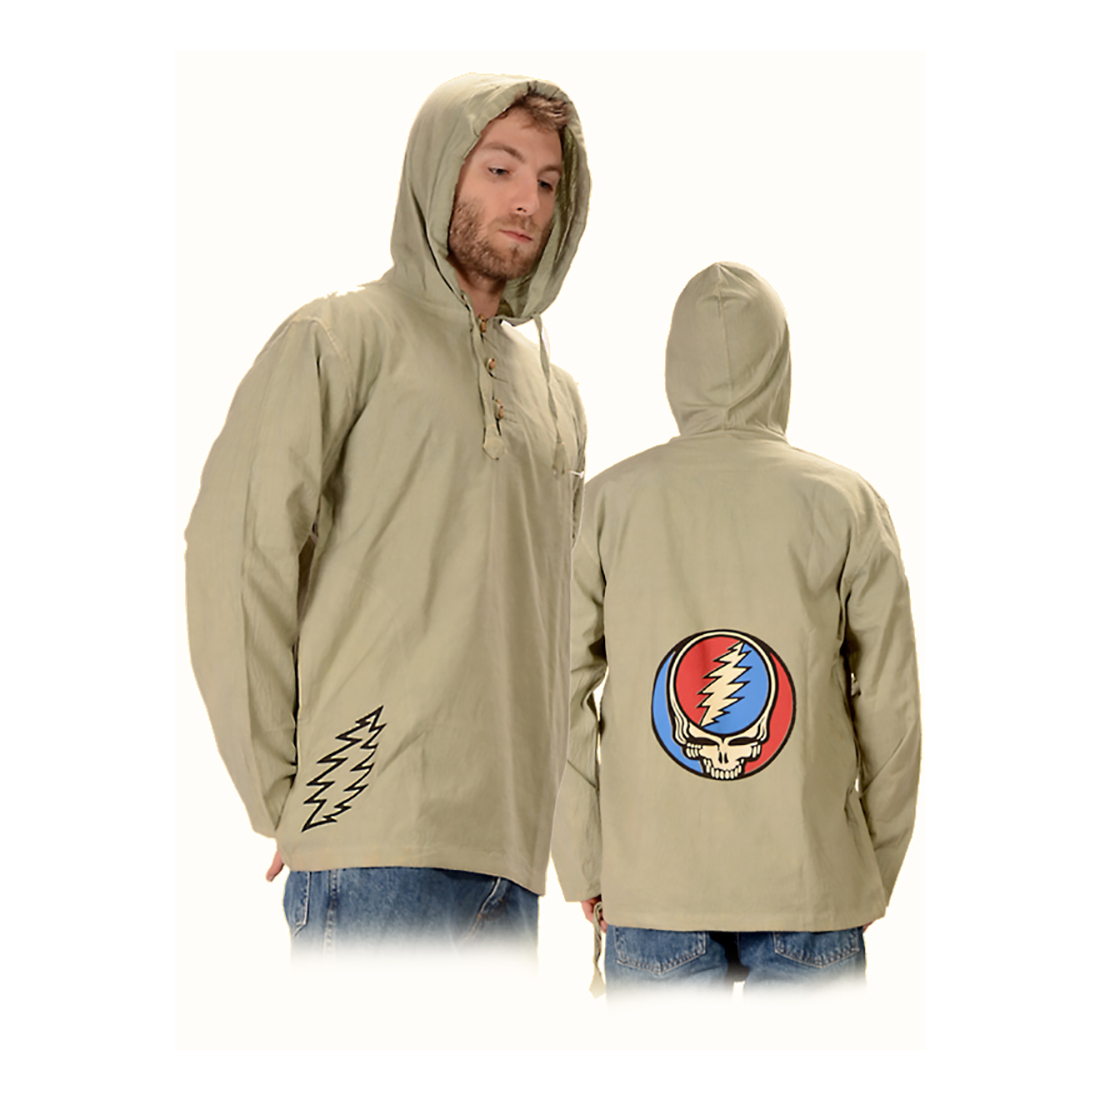 GD SYF Cotton Baja Hoodie